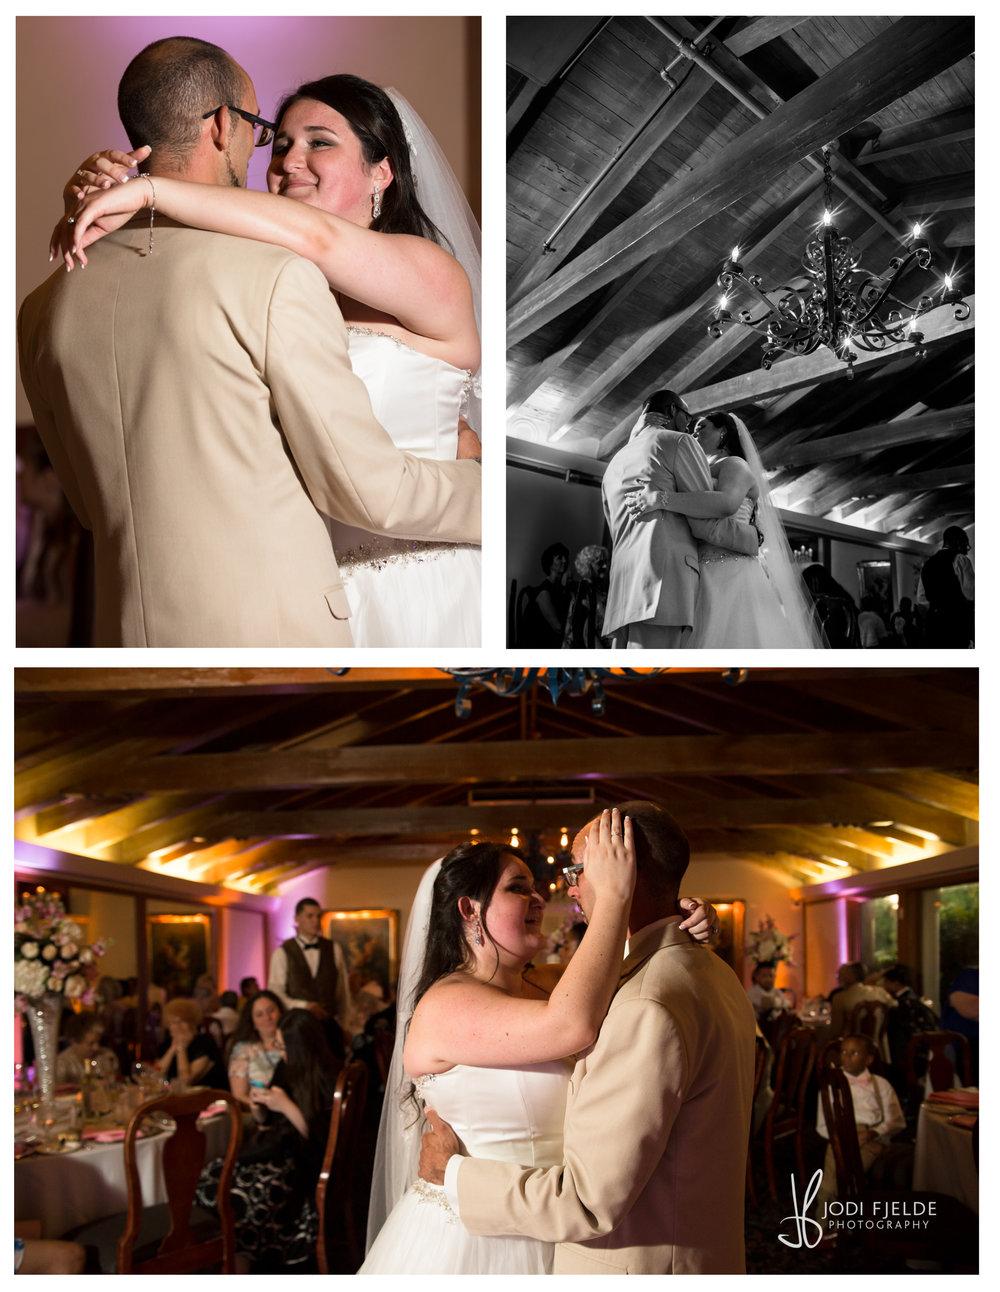 Benvenuto_Boynton Beach_ Wedding_Emily_&_Shawn 30.jpg